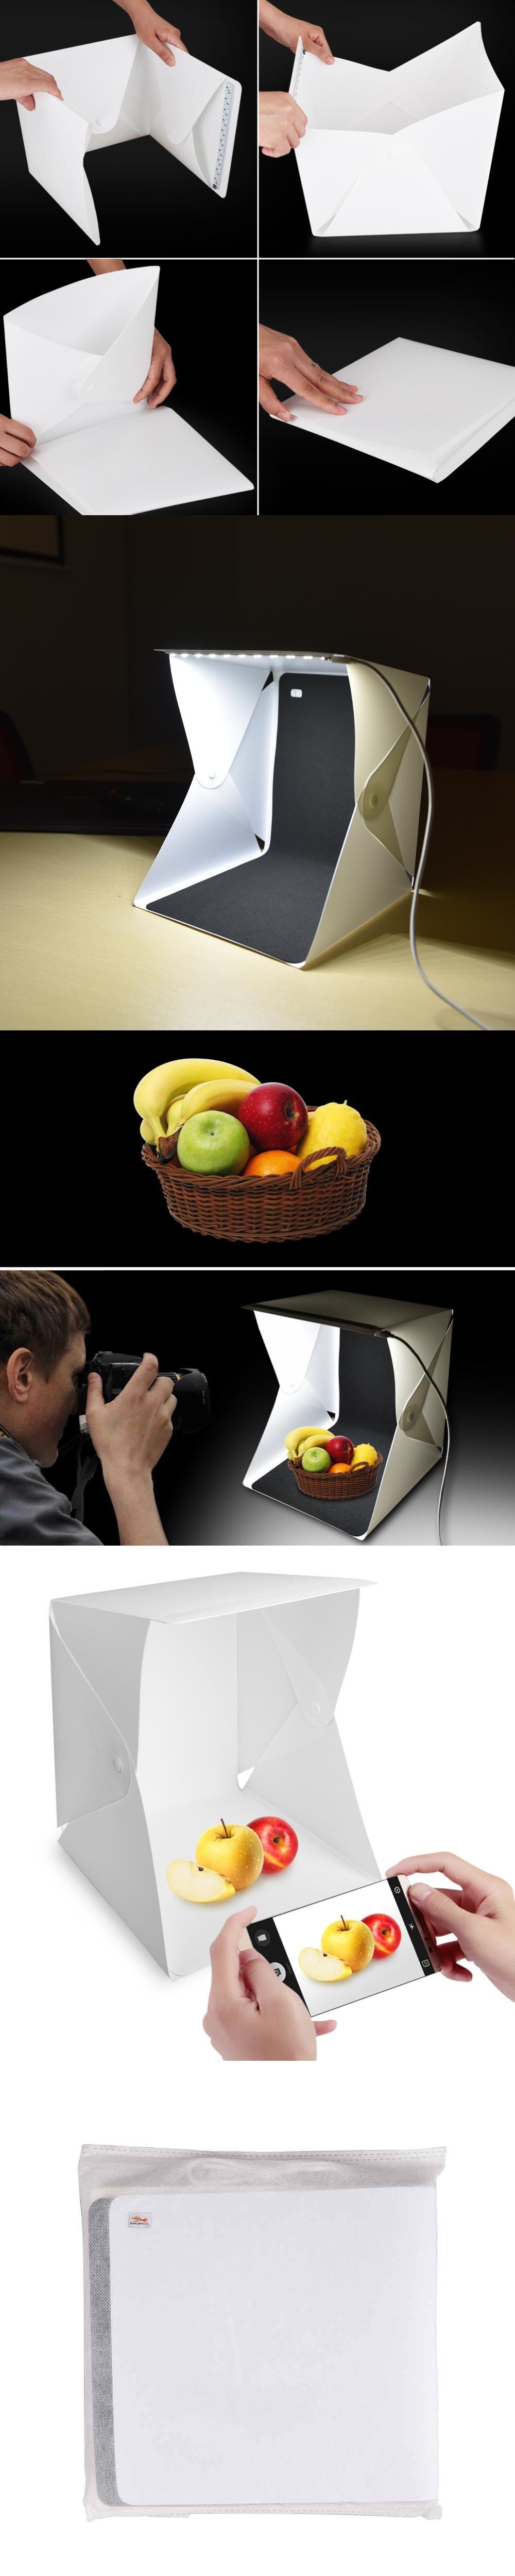 lighting x box tenn project selfridge s portfolio photography light ltd knitwear miss design ltdtenn